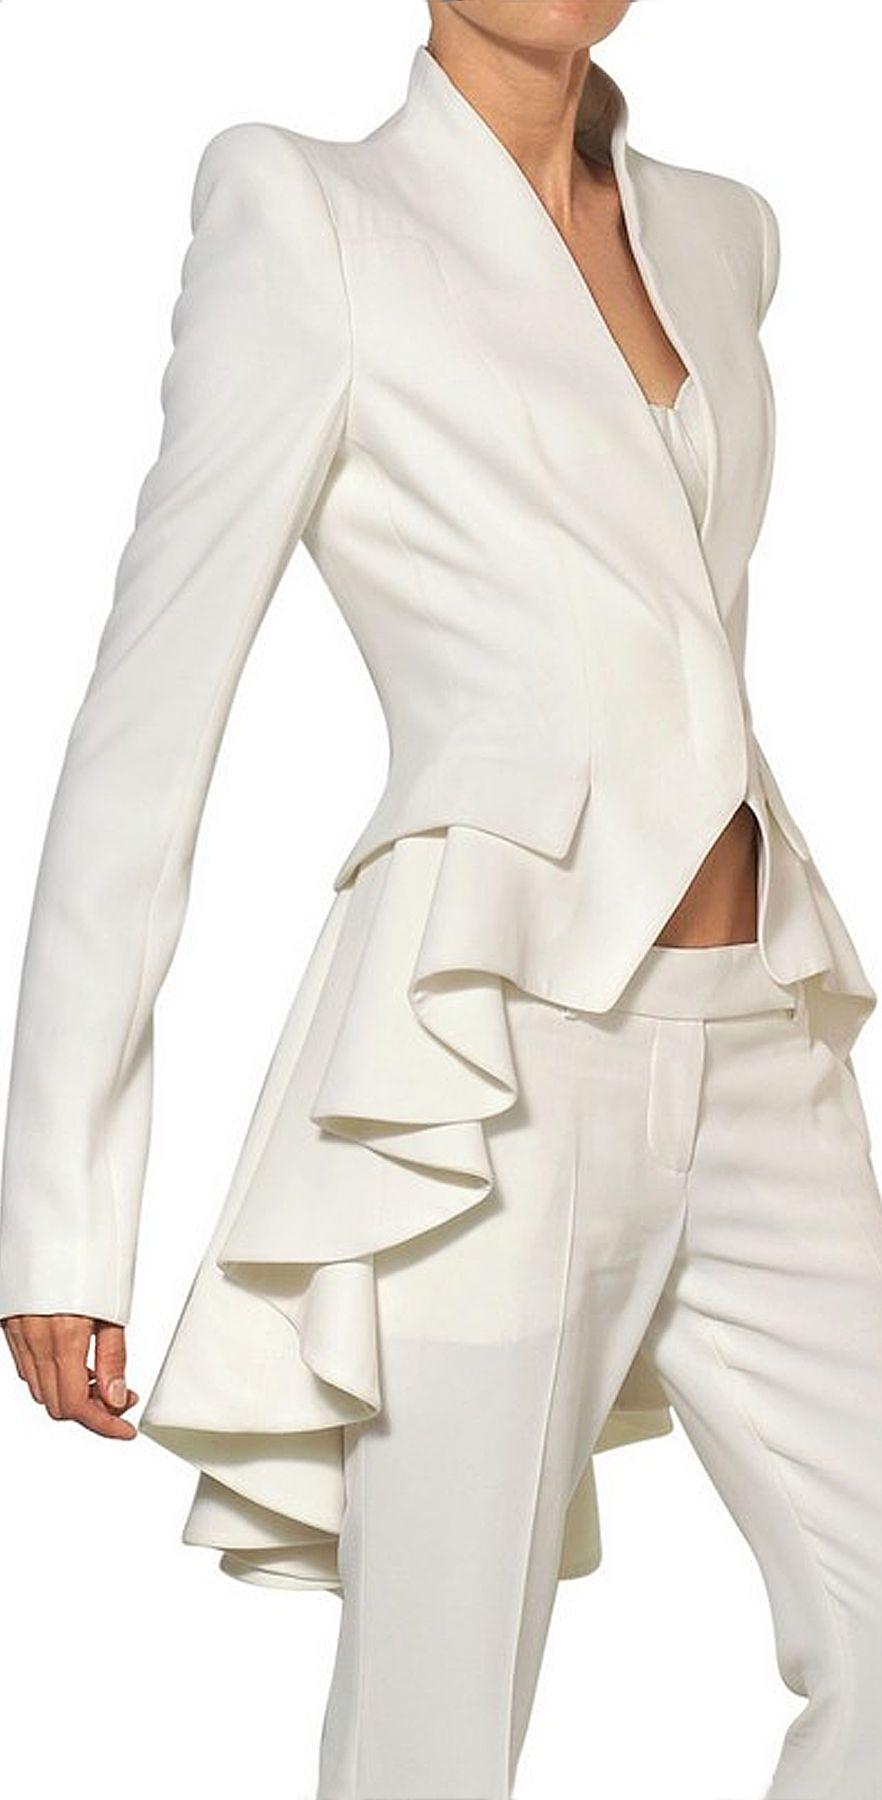 women 39 s white leaf viscose crepe flared trousers. Black Bedroom Furniture Sets. Home Design Ideas